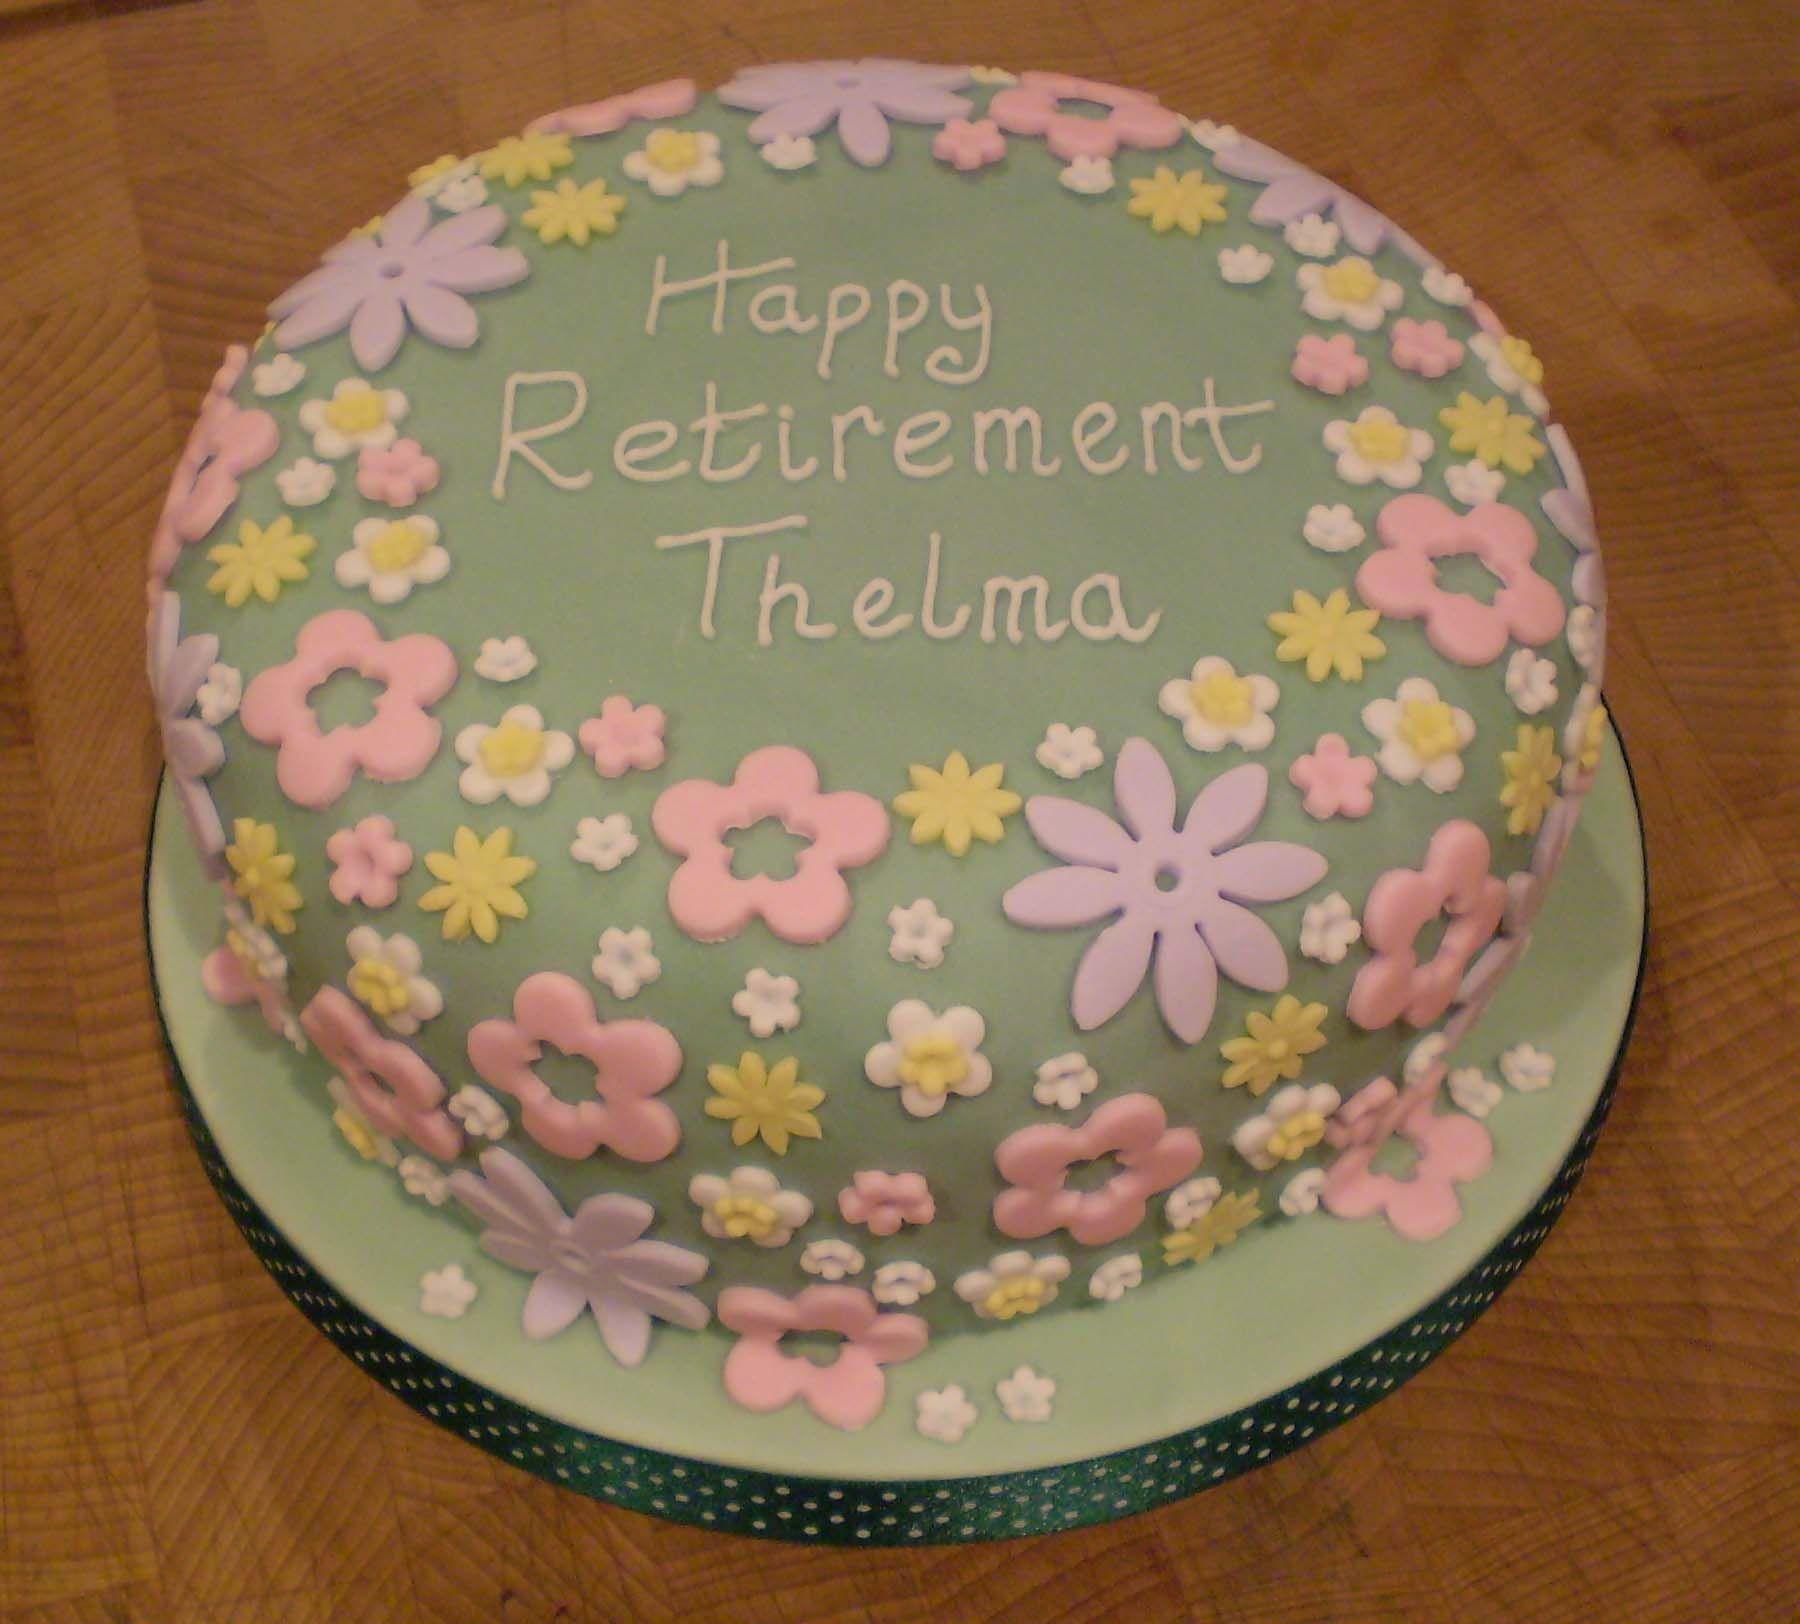 Retirement Cakes For Women Retirement Cakes For W...